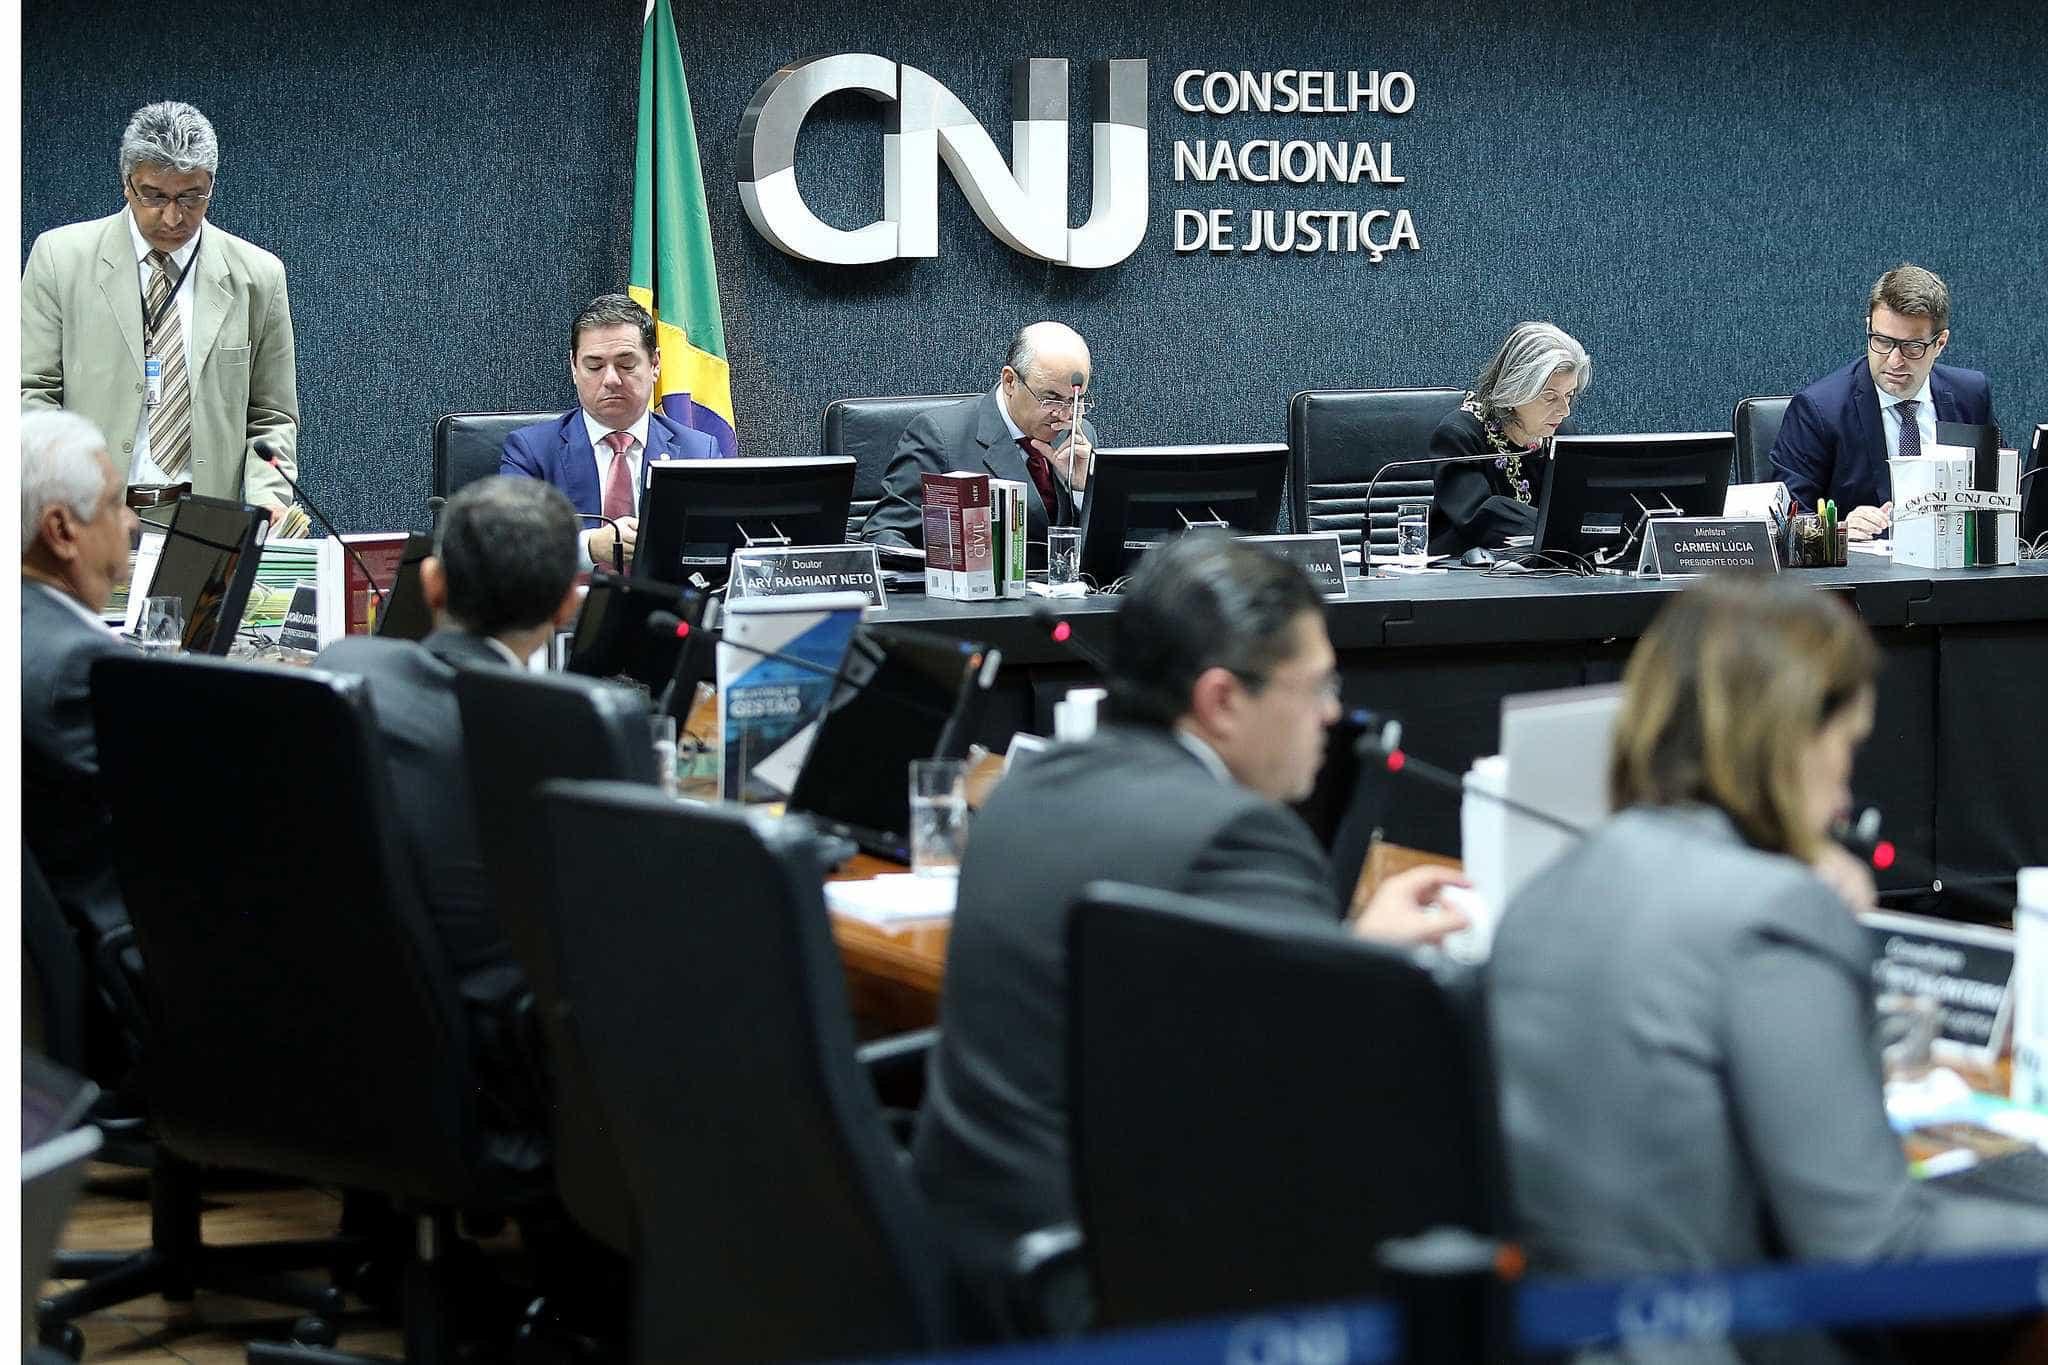 CNJ prevê votar nesta terça auxílio-moradia mais restrito para juízes